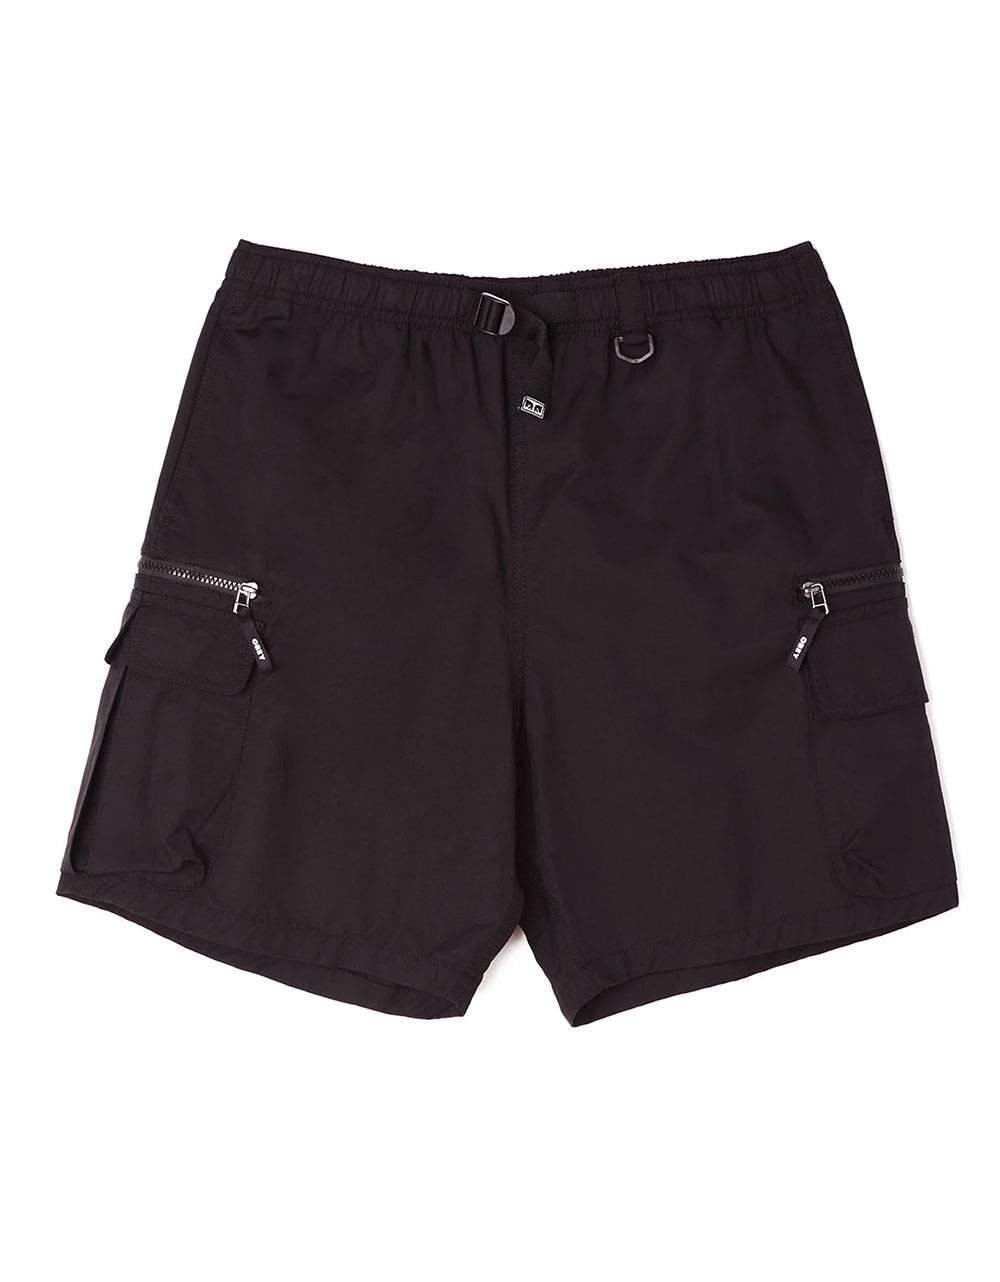 Obey Warfield trek shorts - black obey Shorts 95,00€